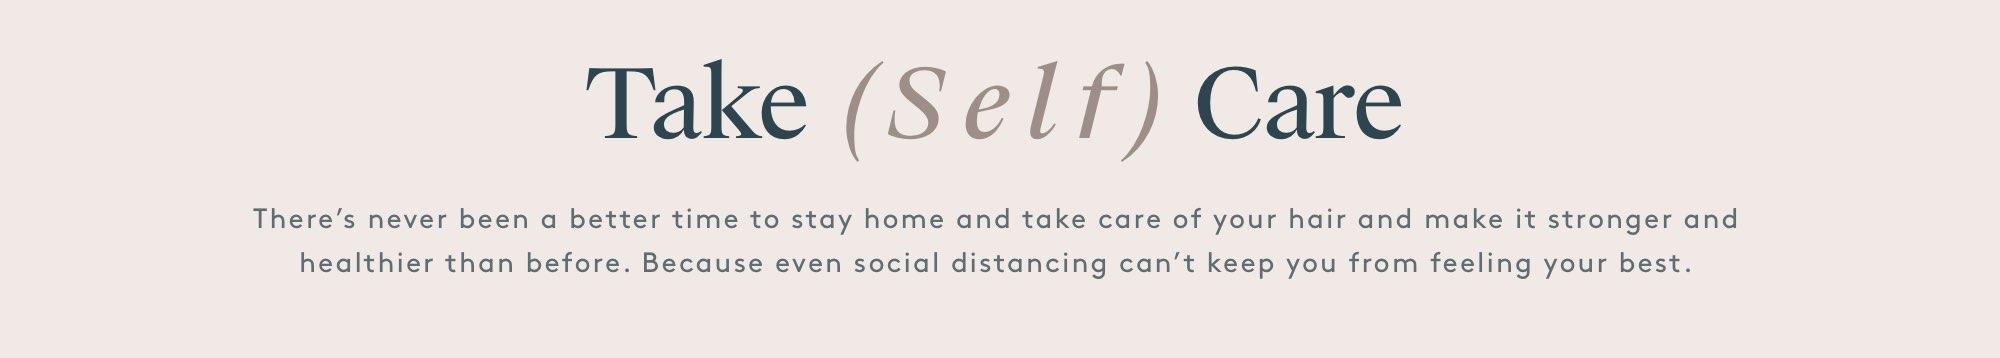 Take Self Care